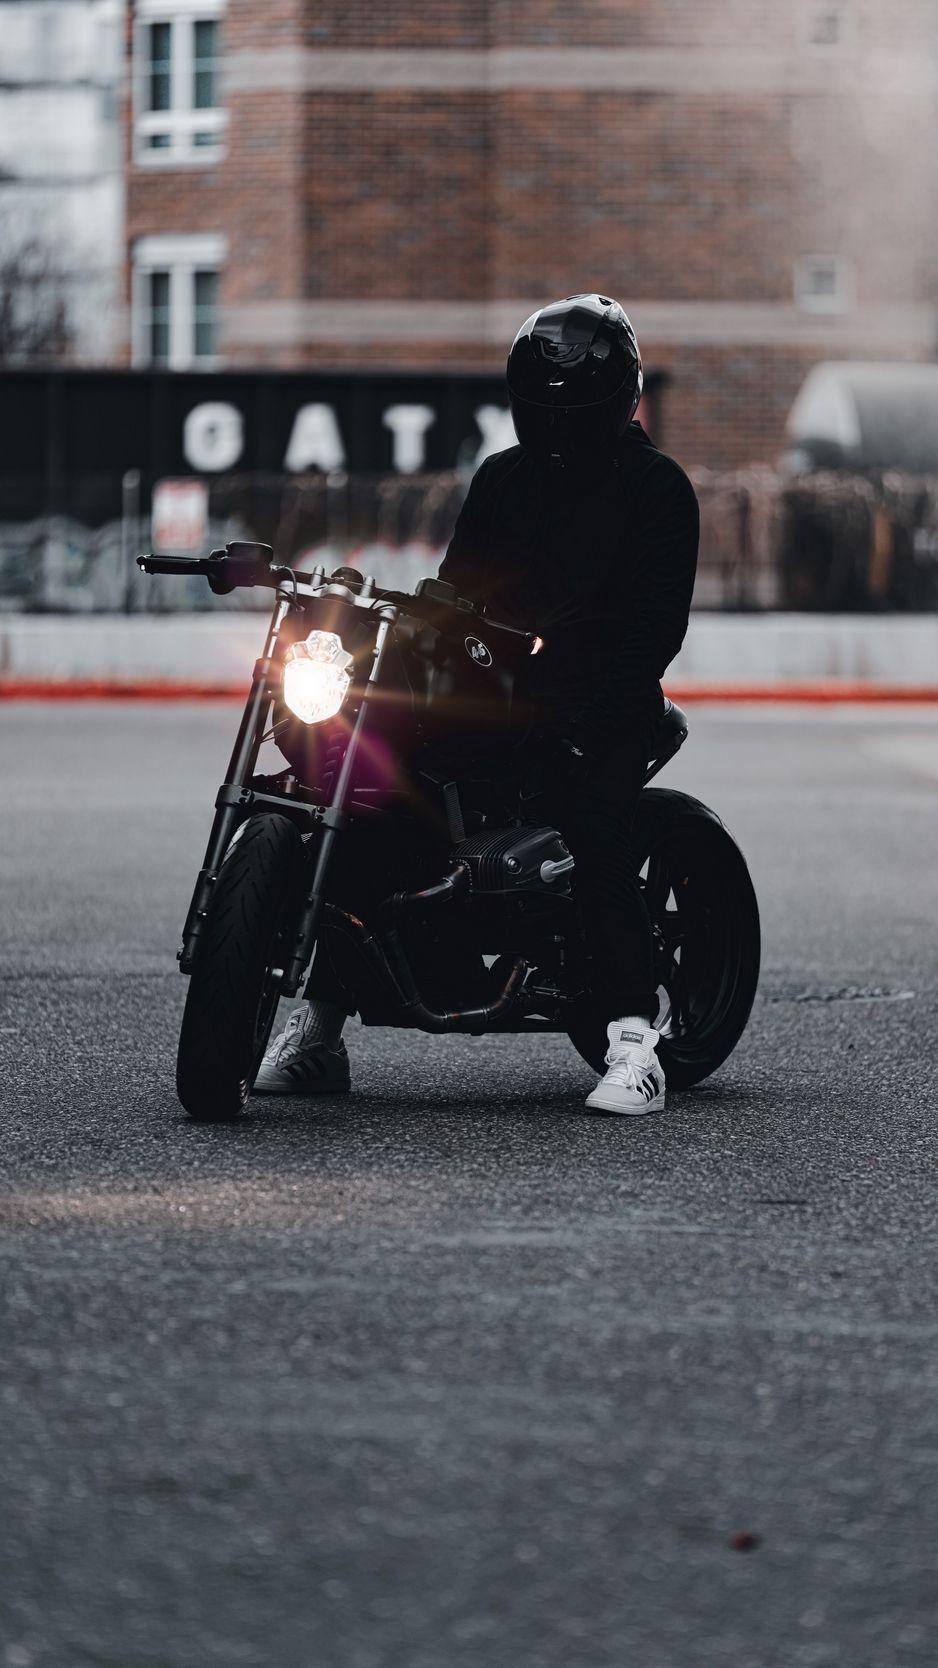 938x1668 Обои мотоцикл, байк, мотоциклист, черный, свет, дорога